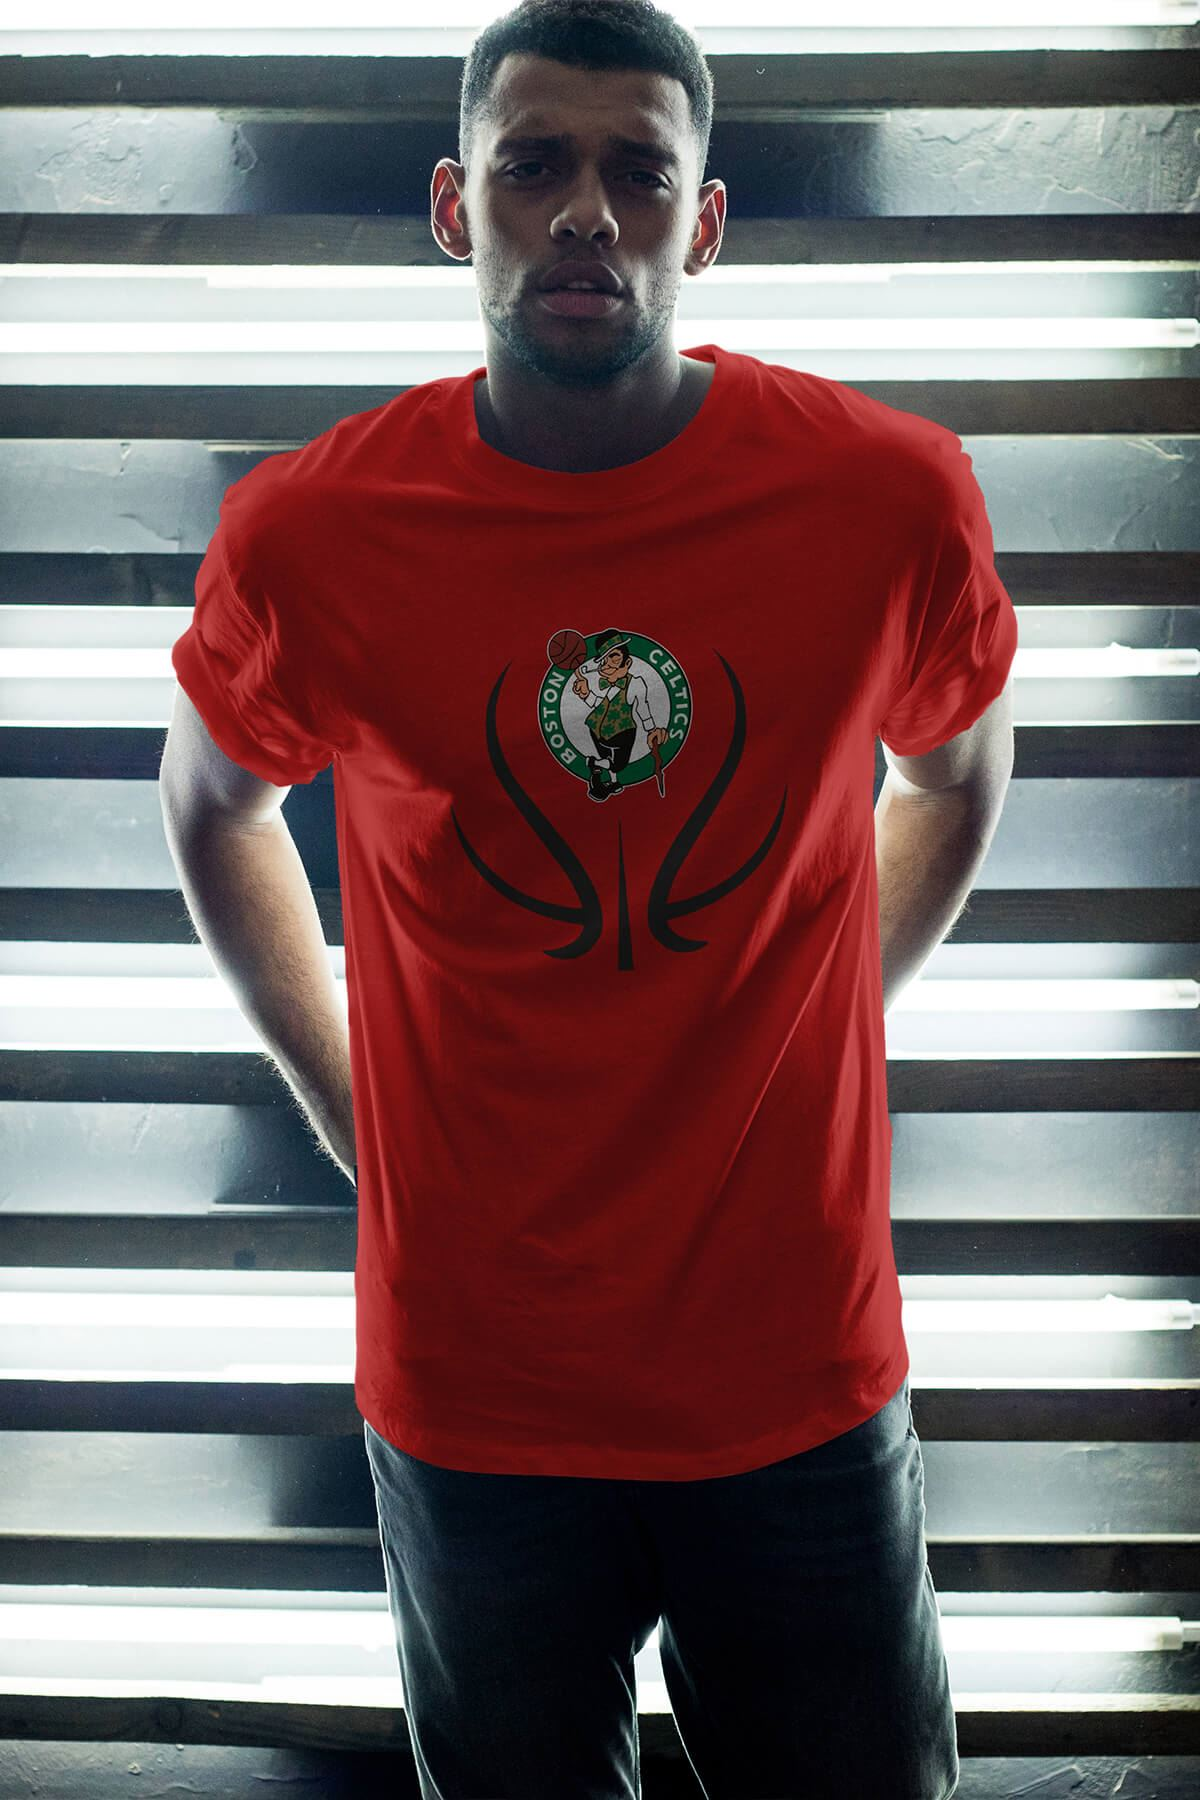 Boston Celtics 29 Kırmızı Erkek Oversize Tshirt - Tişört